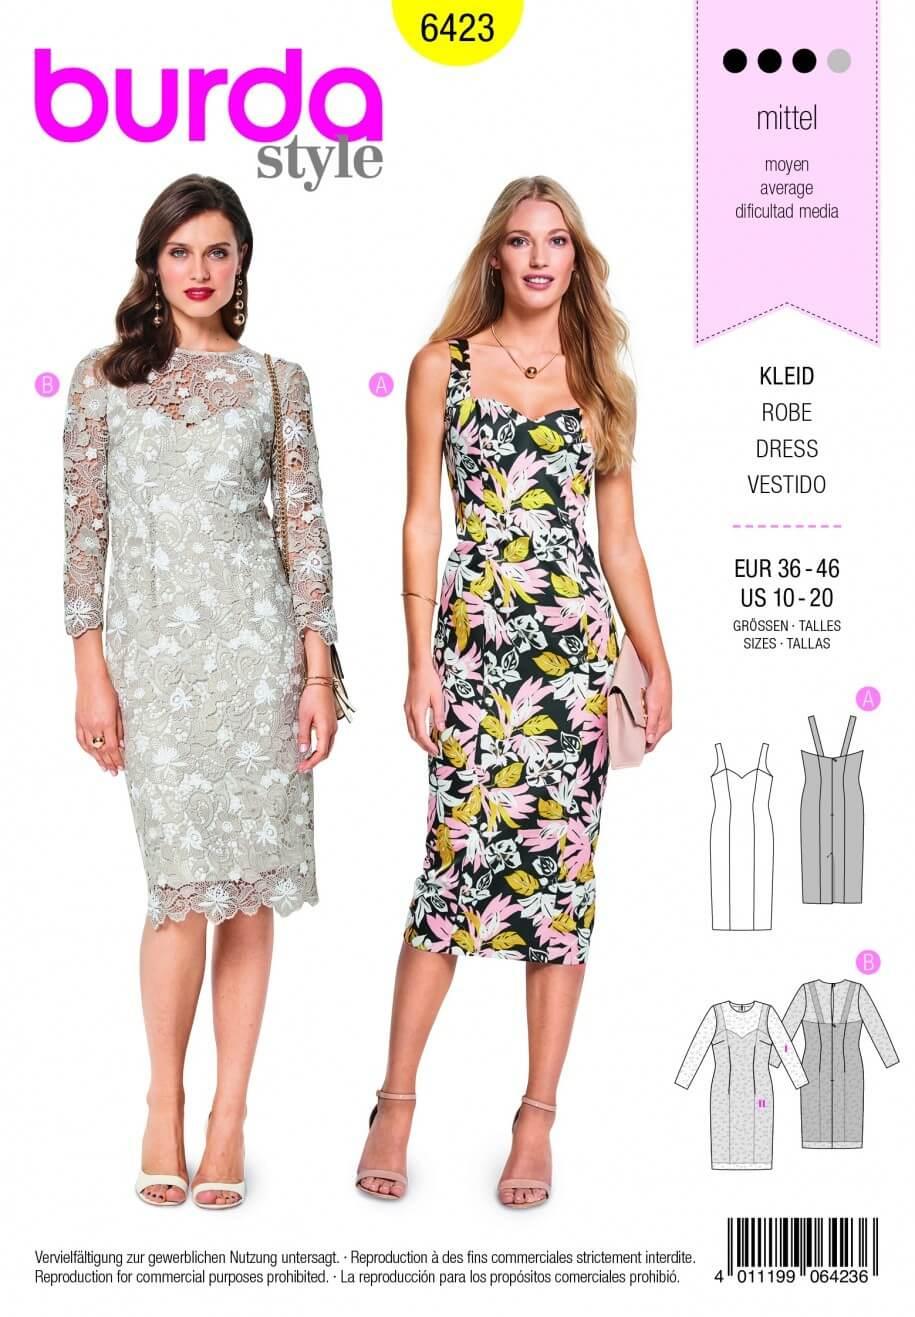 Burda Style Strap Summer Dress Heart Shape Neckline Fabric Sewing Pattern 6423